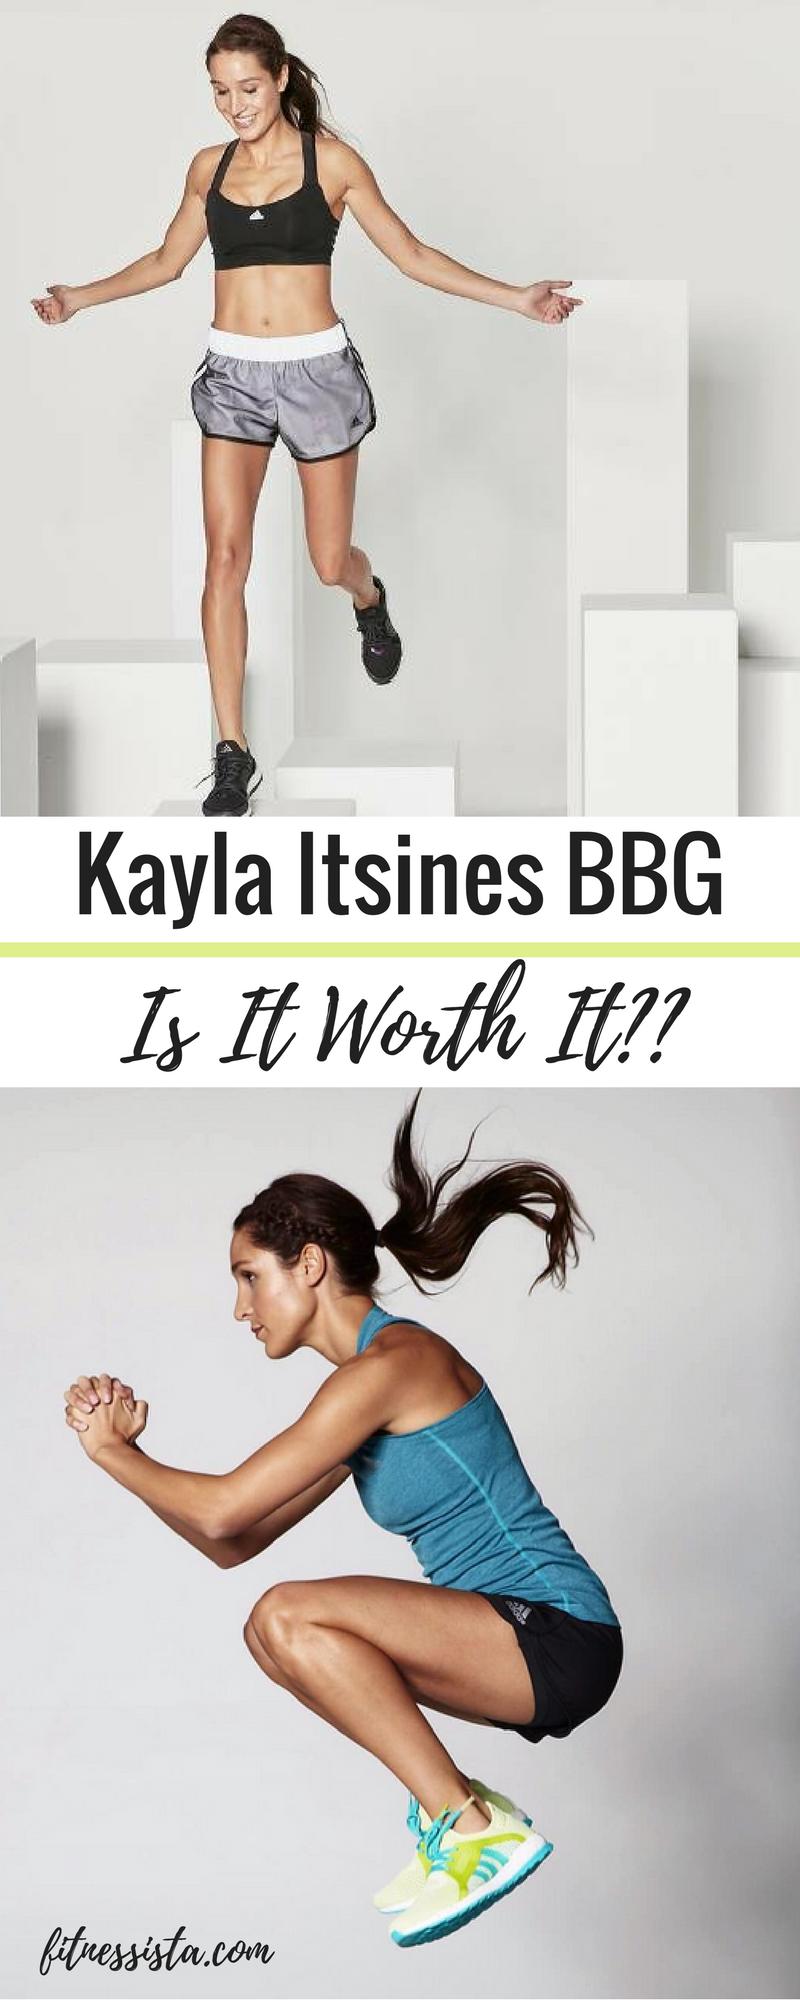 Kayla Itsines Regrets Calling Her Workout Plans Bikini Body Guides